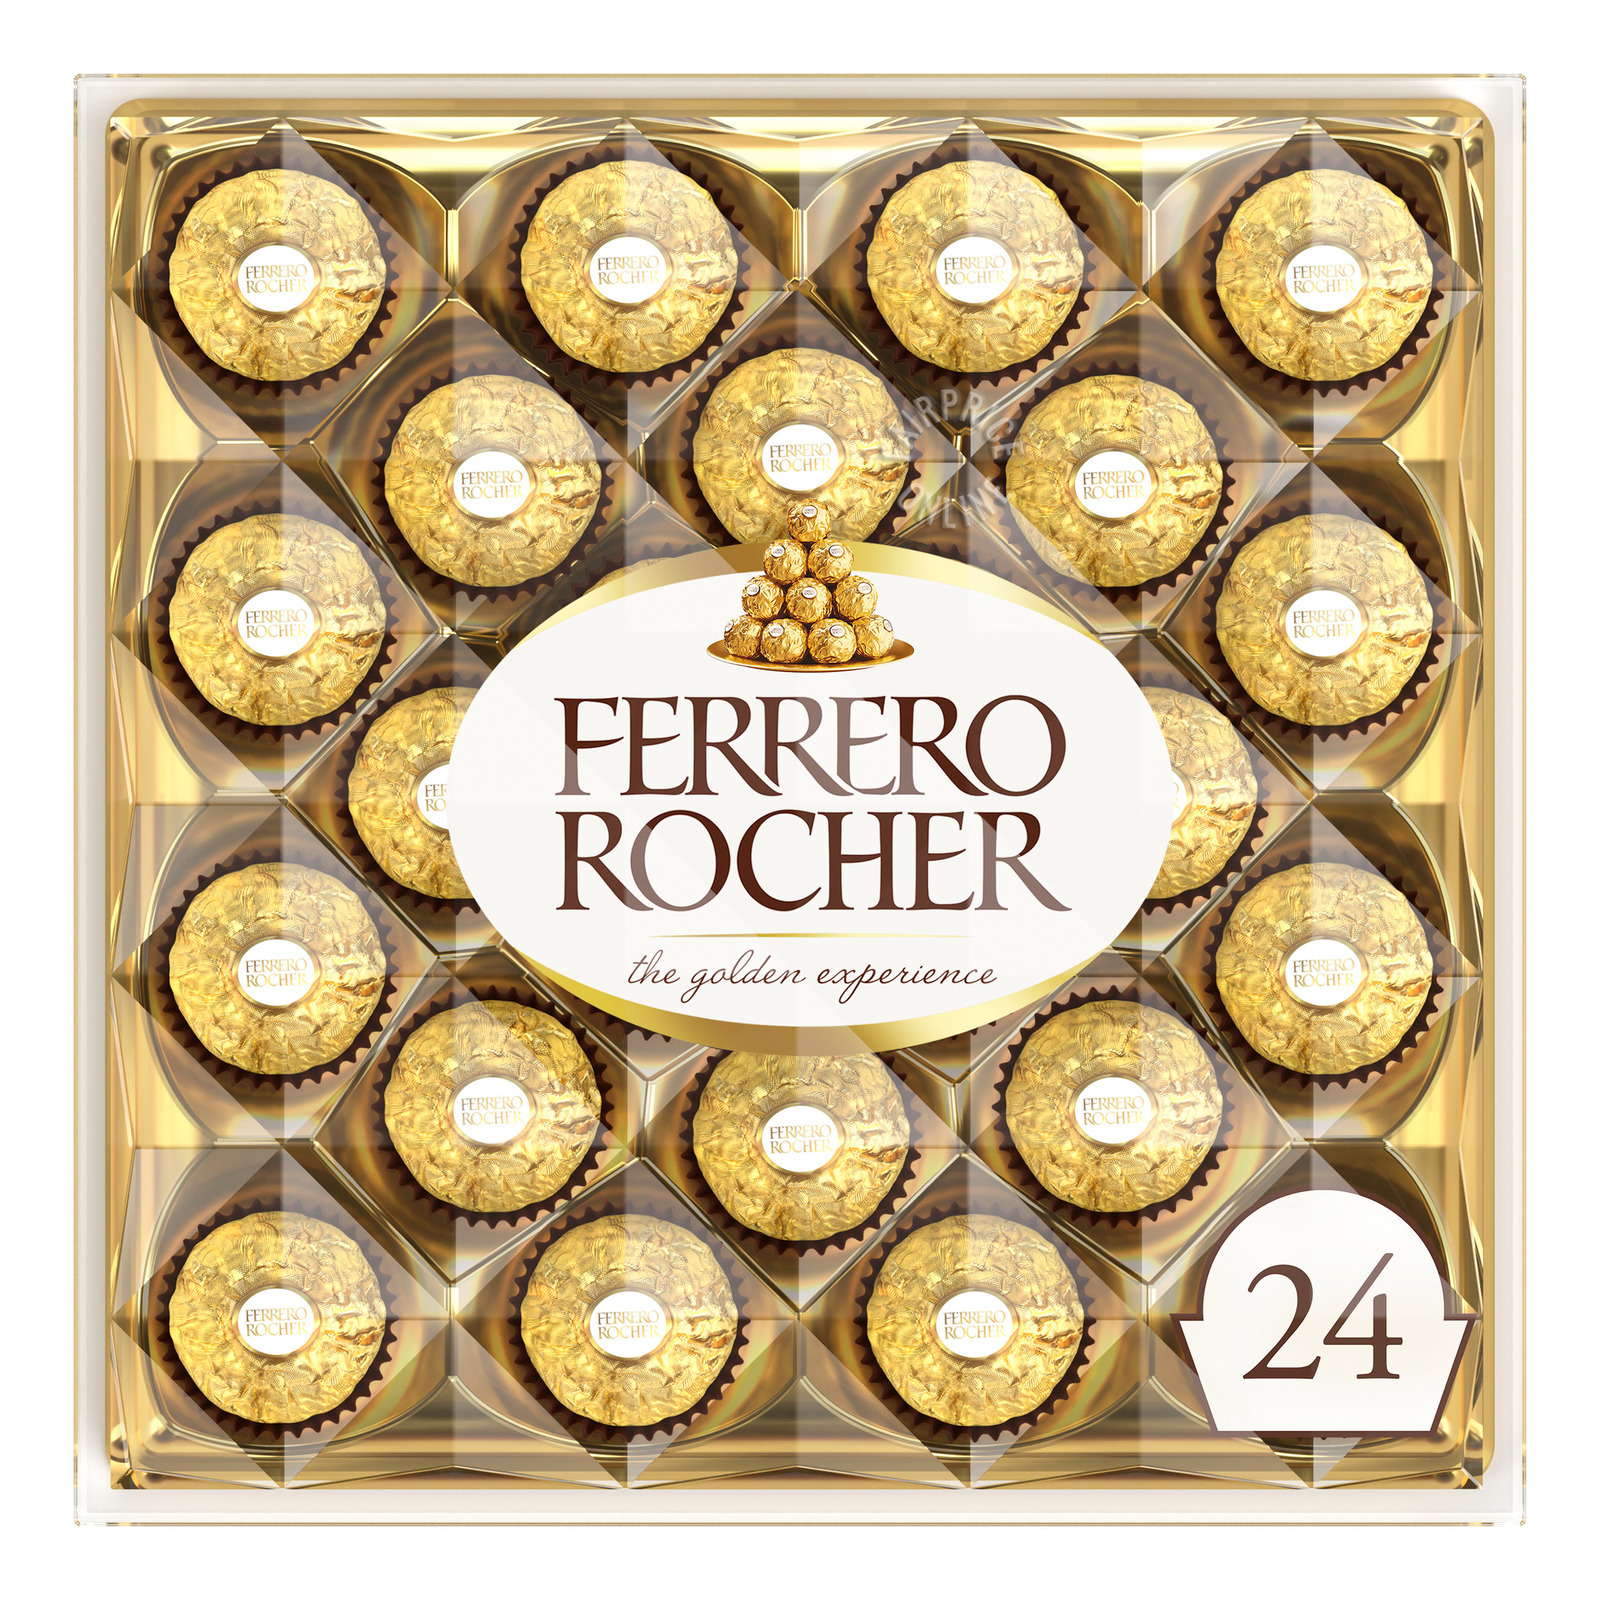 Ferrero Rocher Chocolate - T24